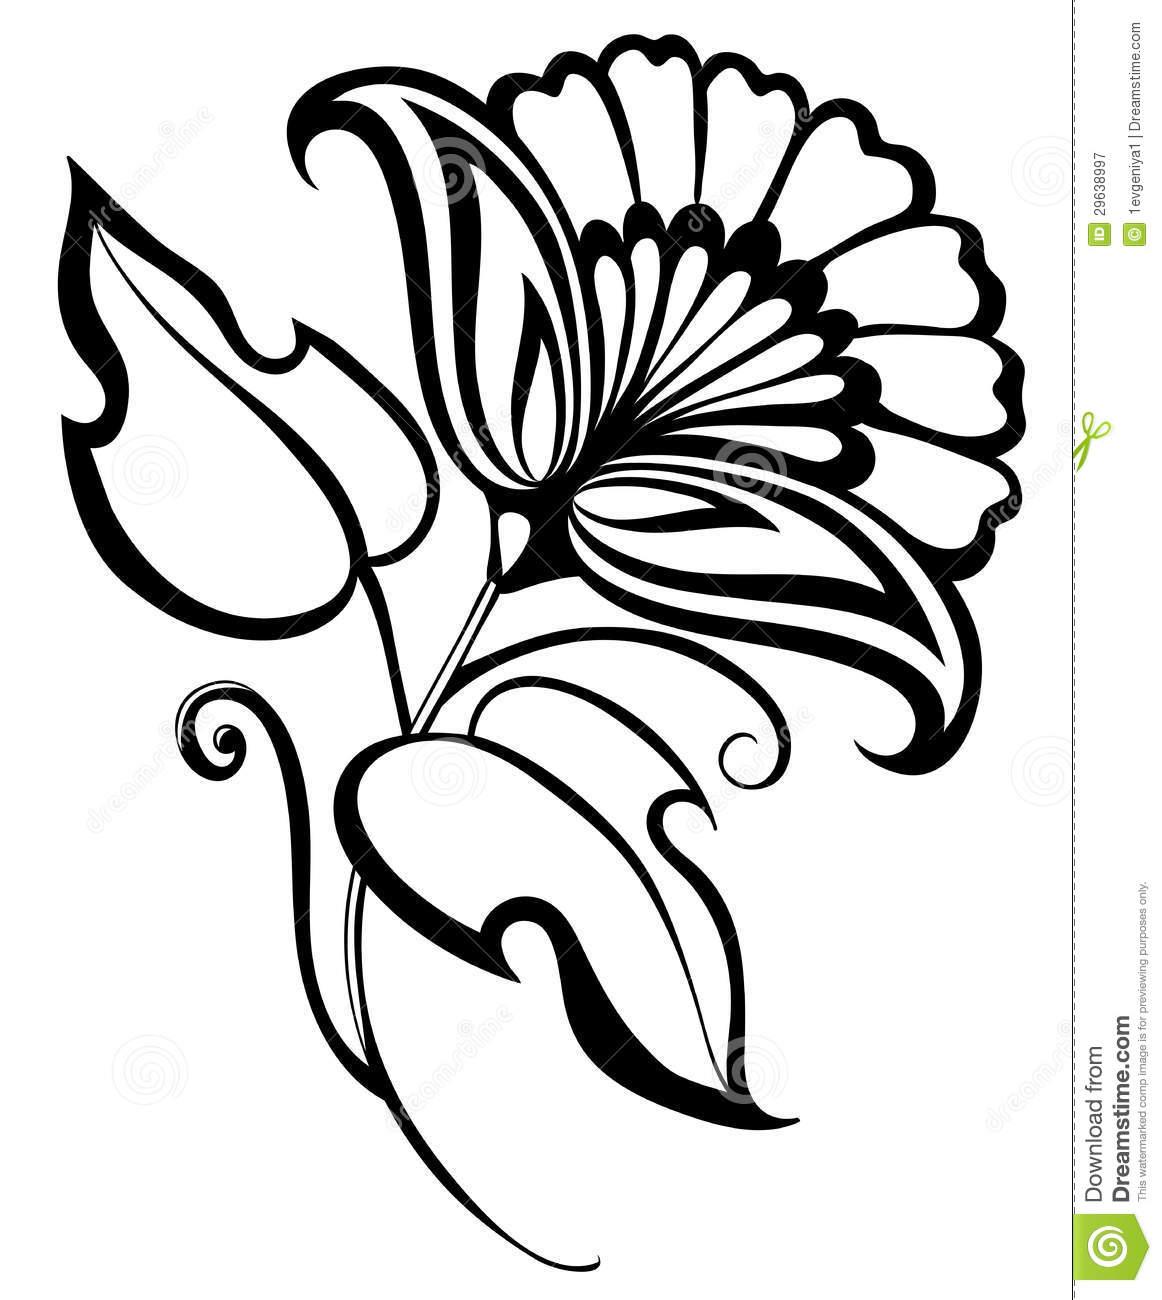 1162x1300 Drawn Flower Design Drawing